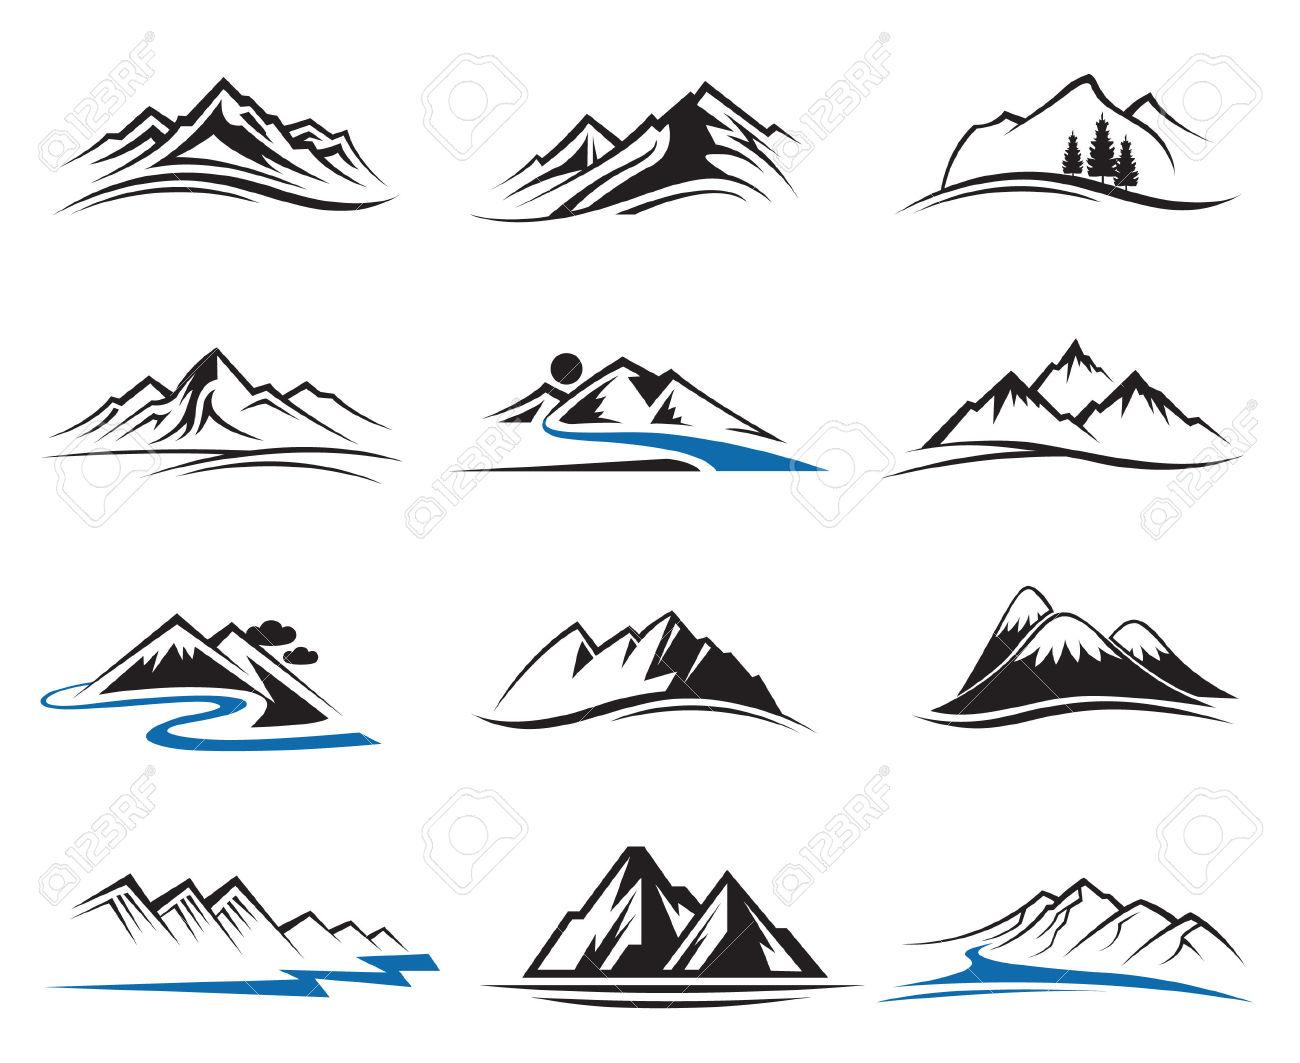 Mountain Ridge clipart #16, Download drawings